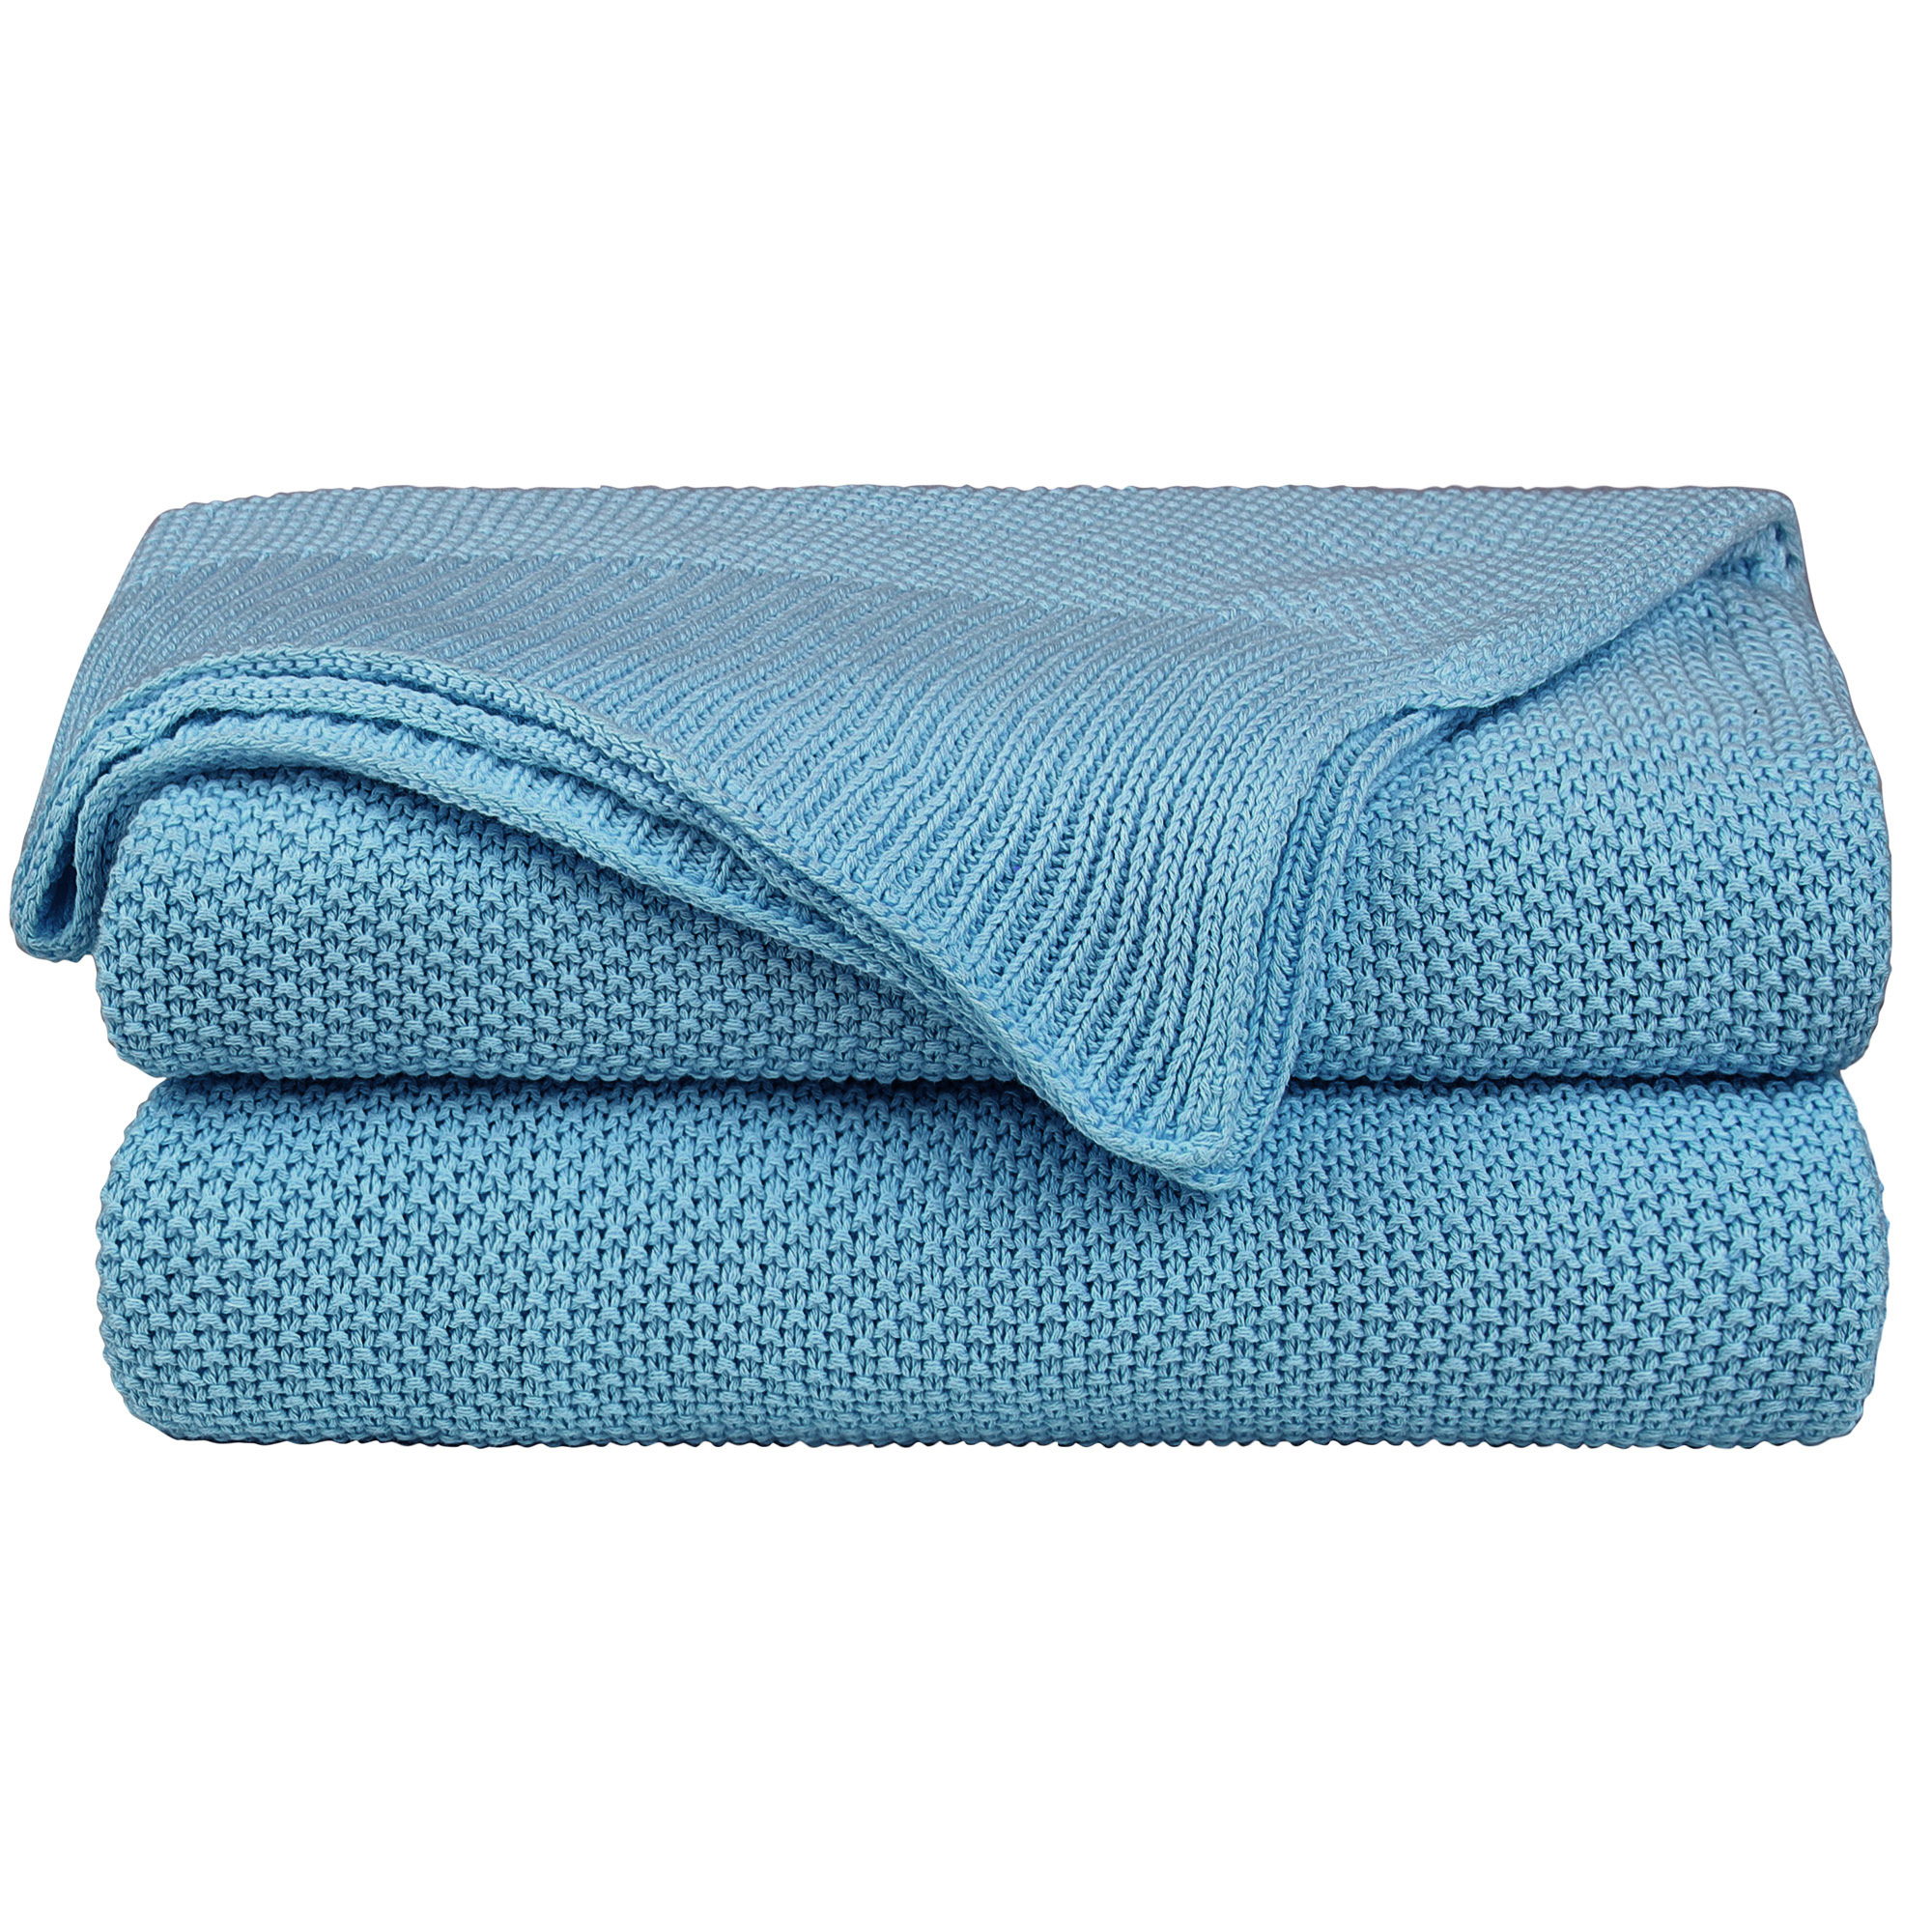 "100% Cotton Soft Warm Knit Twin Size Blanket Bed Sofa 60"" x 80"" Horizon Blue"